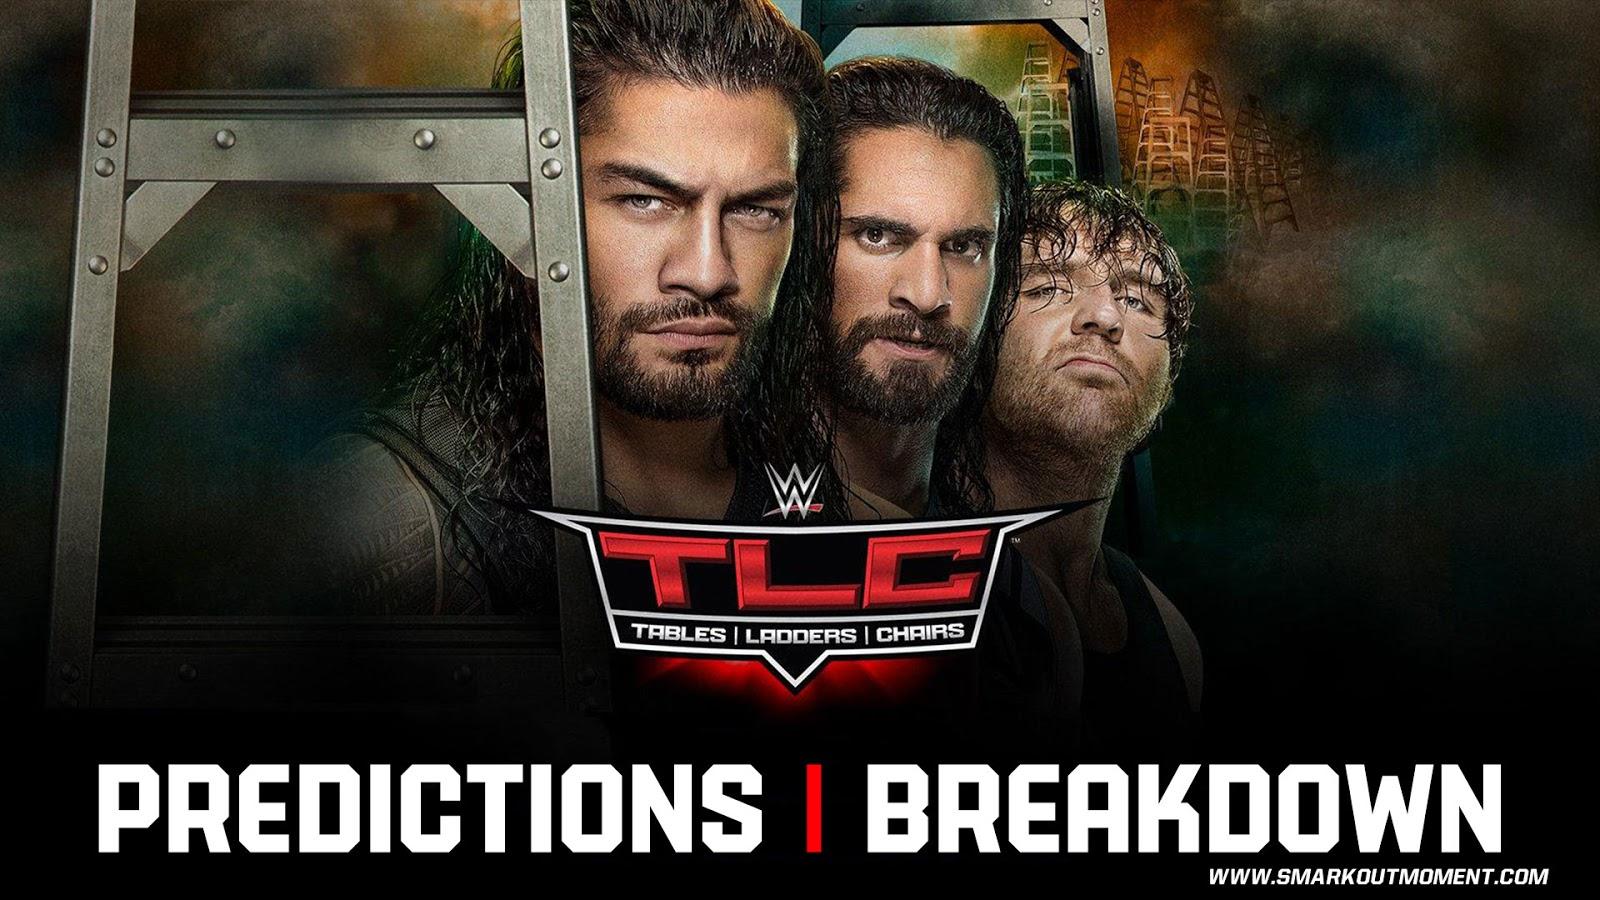 WWE TLC 2017 spoilers podcast